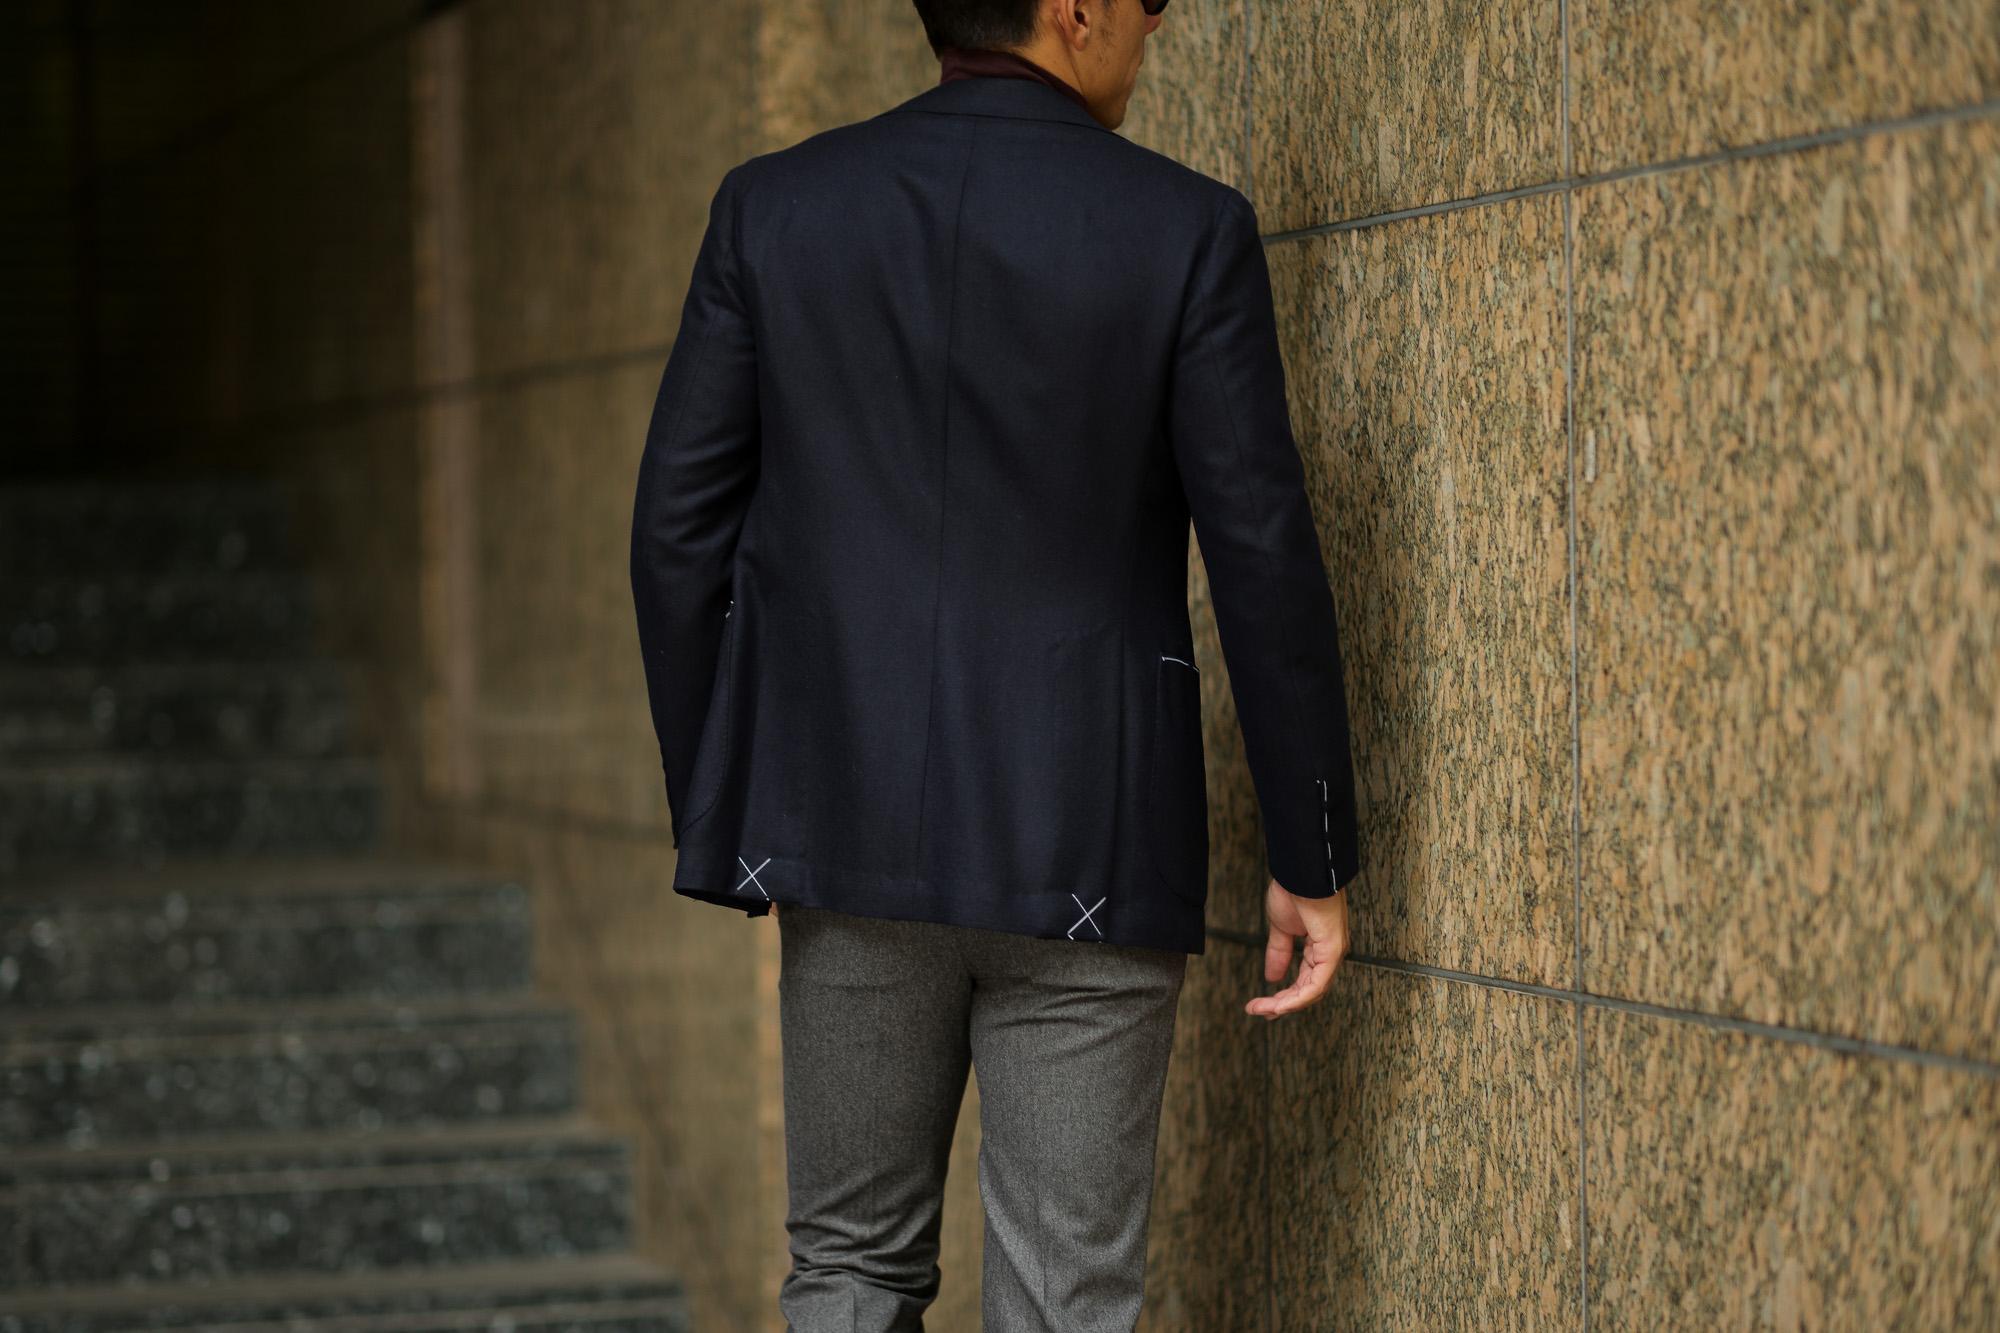 De Petrillo (デ ペトリロ) NAPOLI Posillipo (ナポリ ポジリポ) カシミア モールスキン 段返り3B ジャケット NAVY (ネイビー・220) Made in italy (イタリア製) 2018 秋冬新作 depetrillo 愛知 名古屋 Alto e Diritto アルト エ デリット alto e diritto アルトエデリット 42,44,46,48,50,52,54